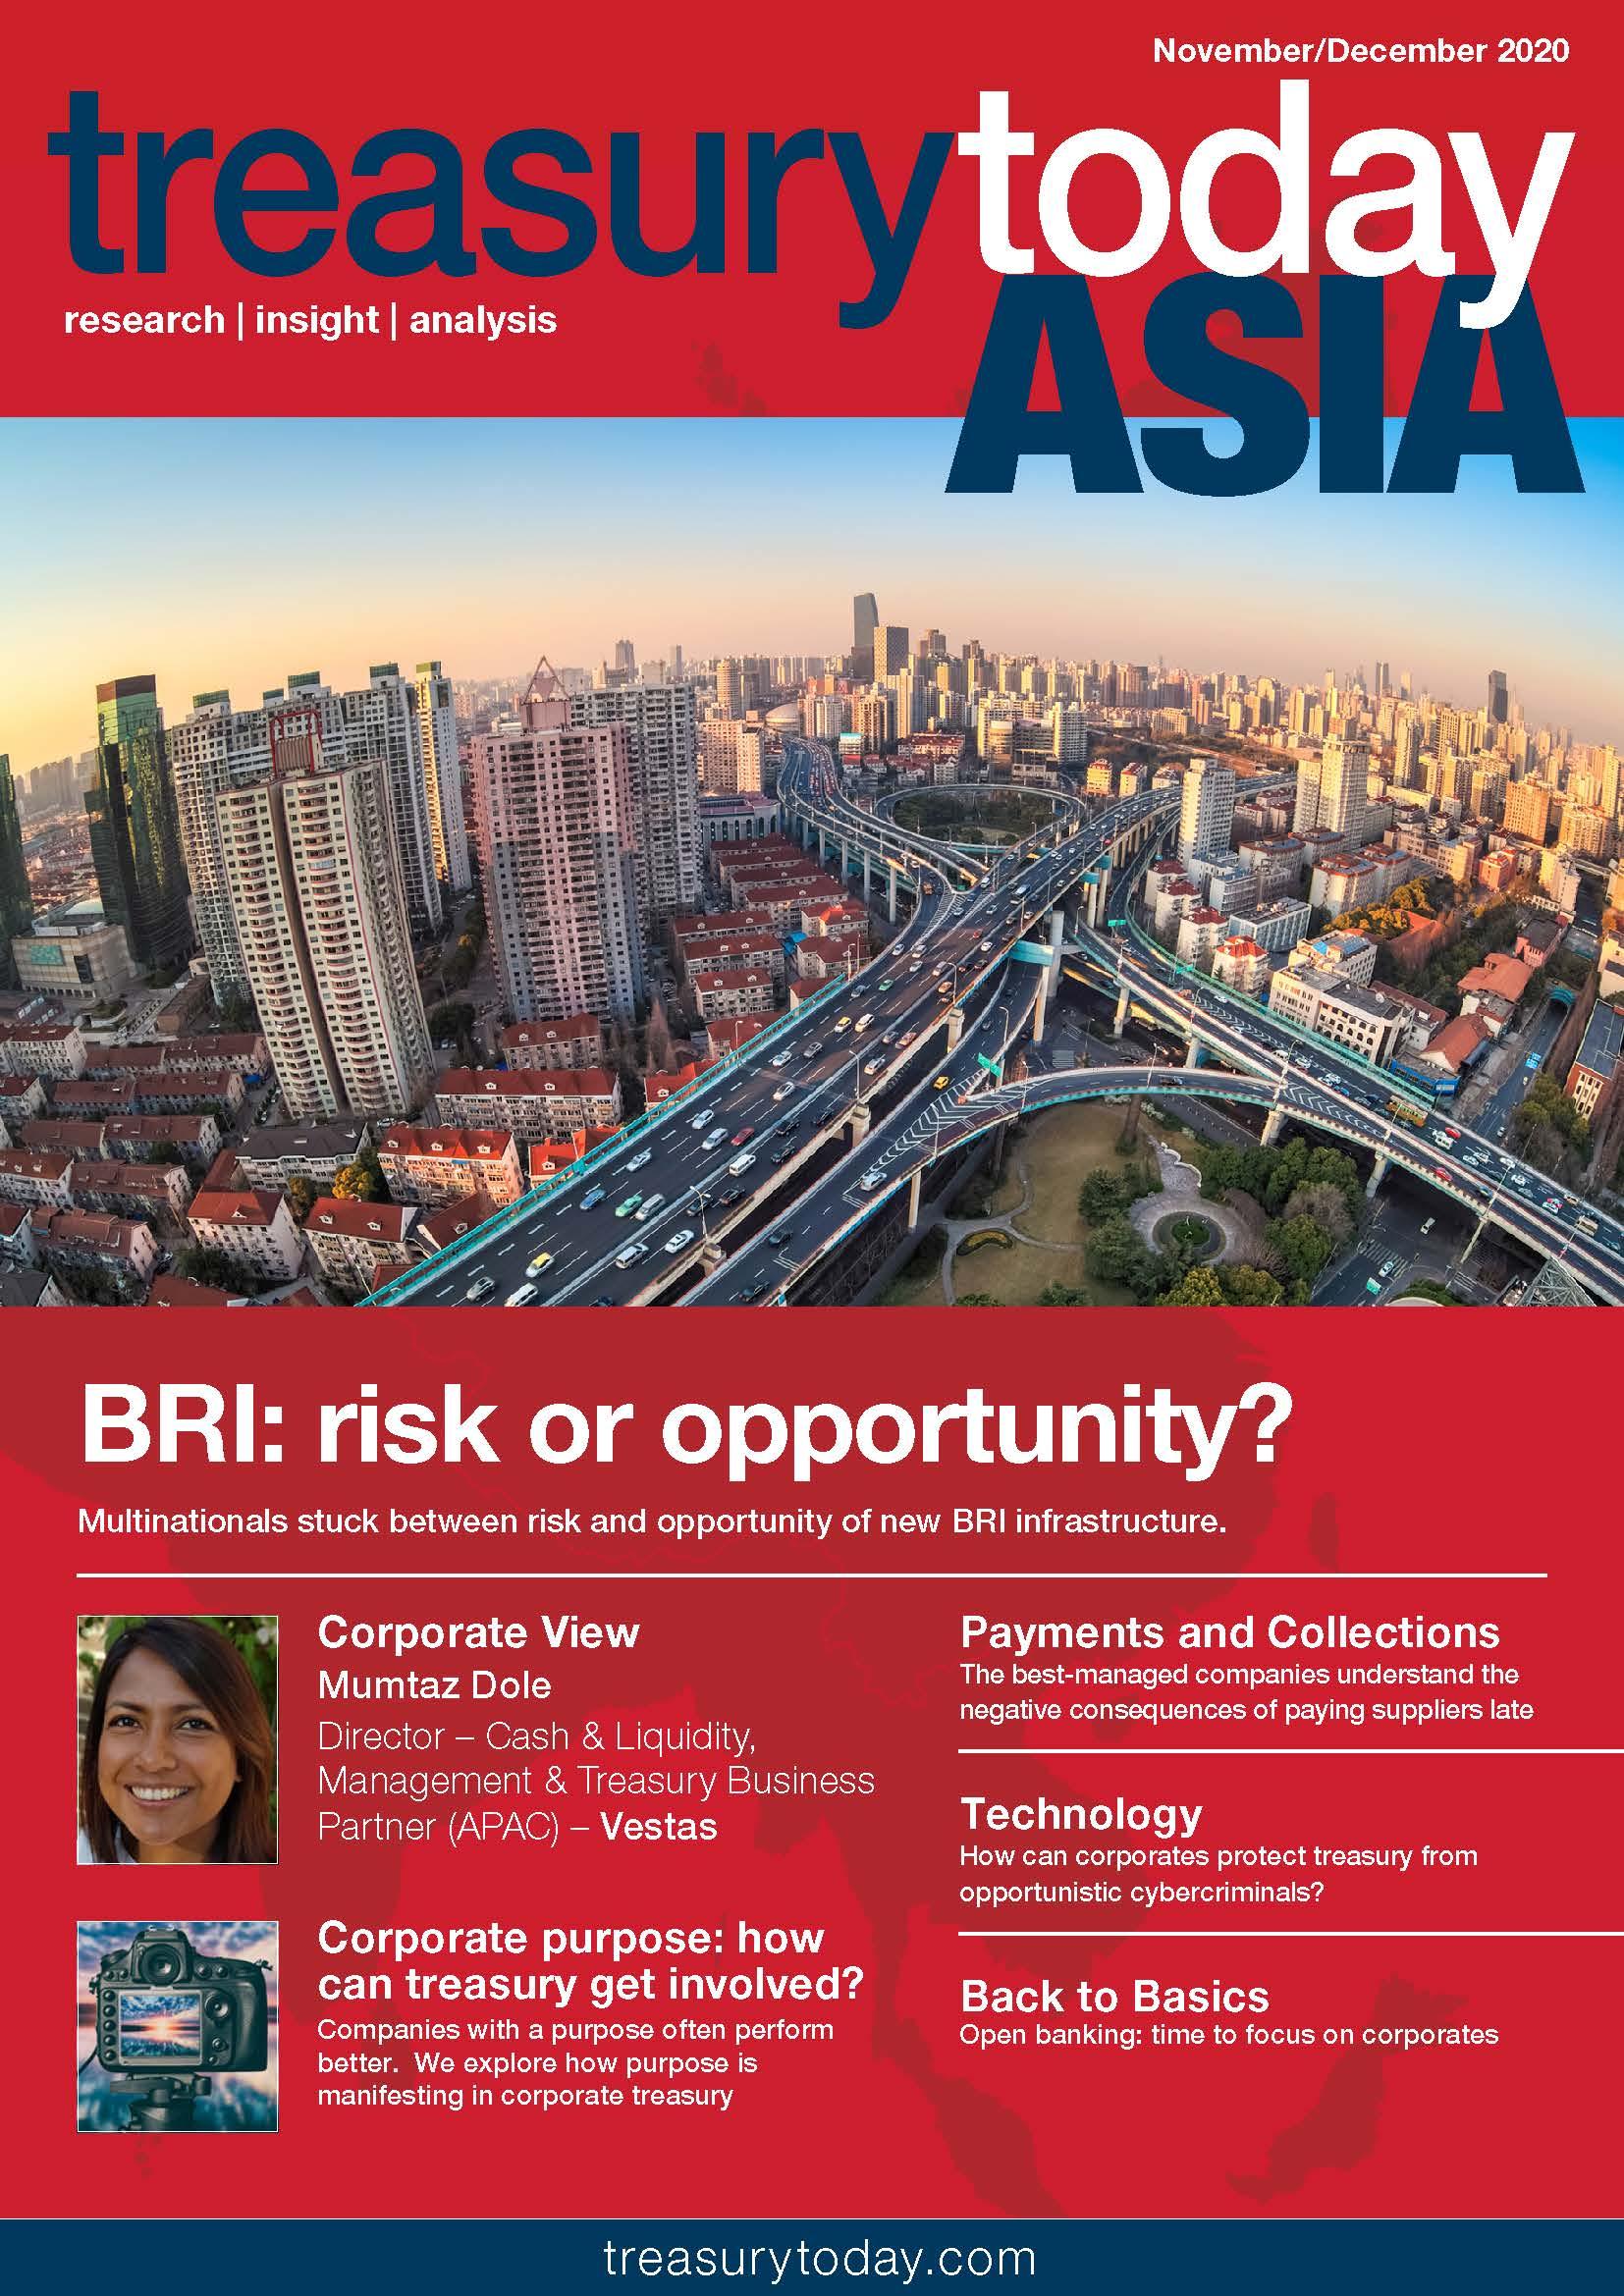 Treasury Today Asia November/December 2020 magazine cover